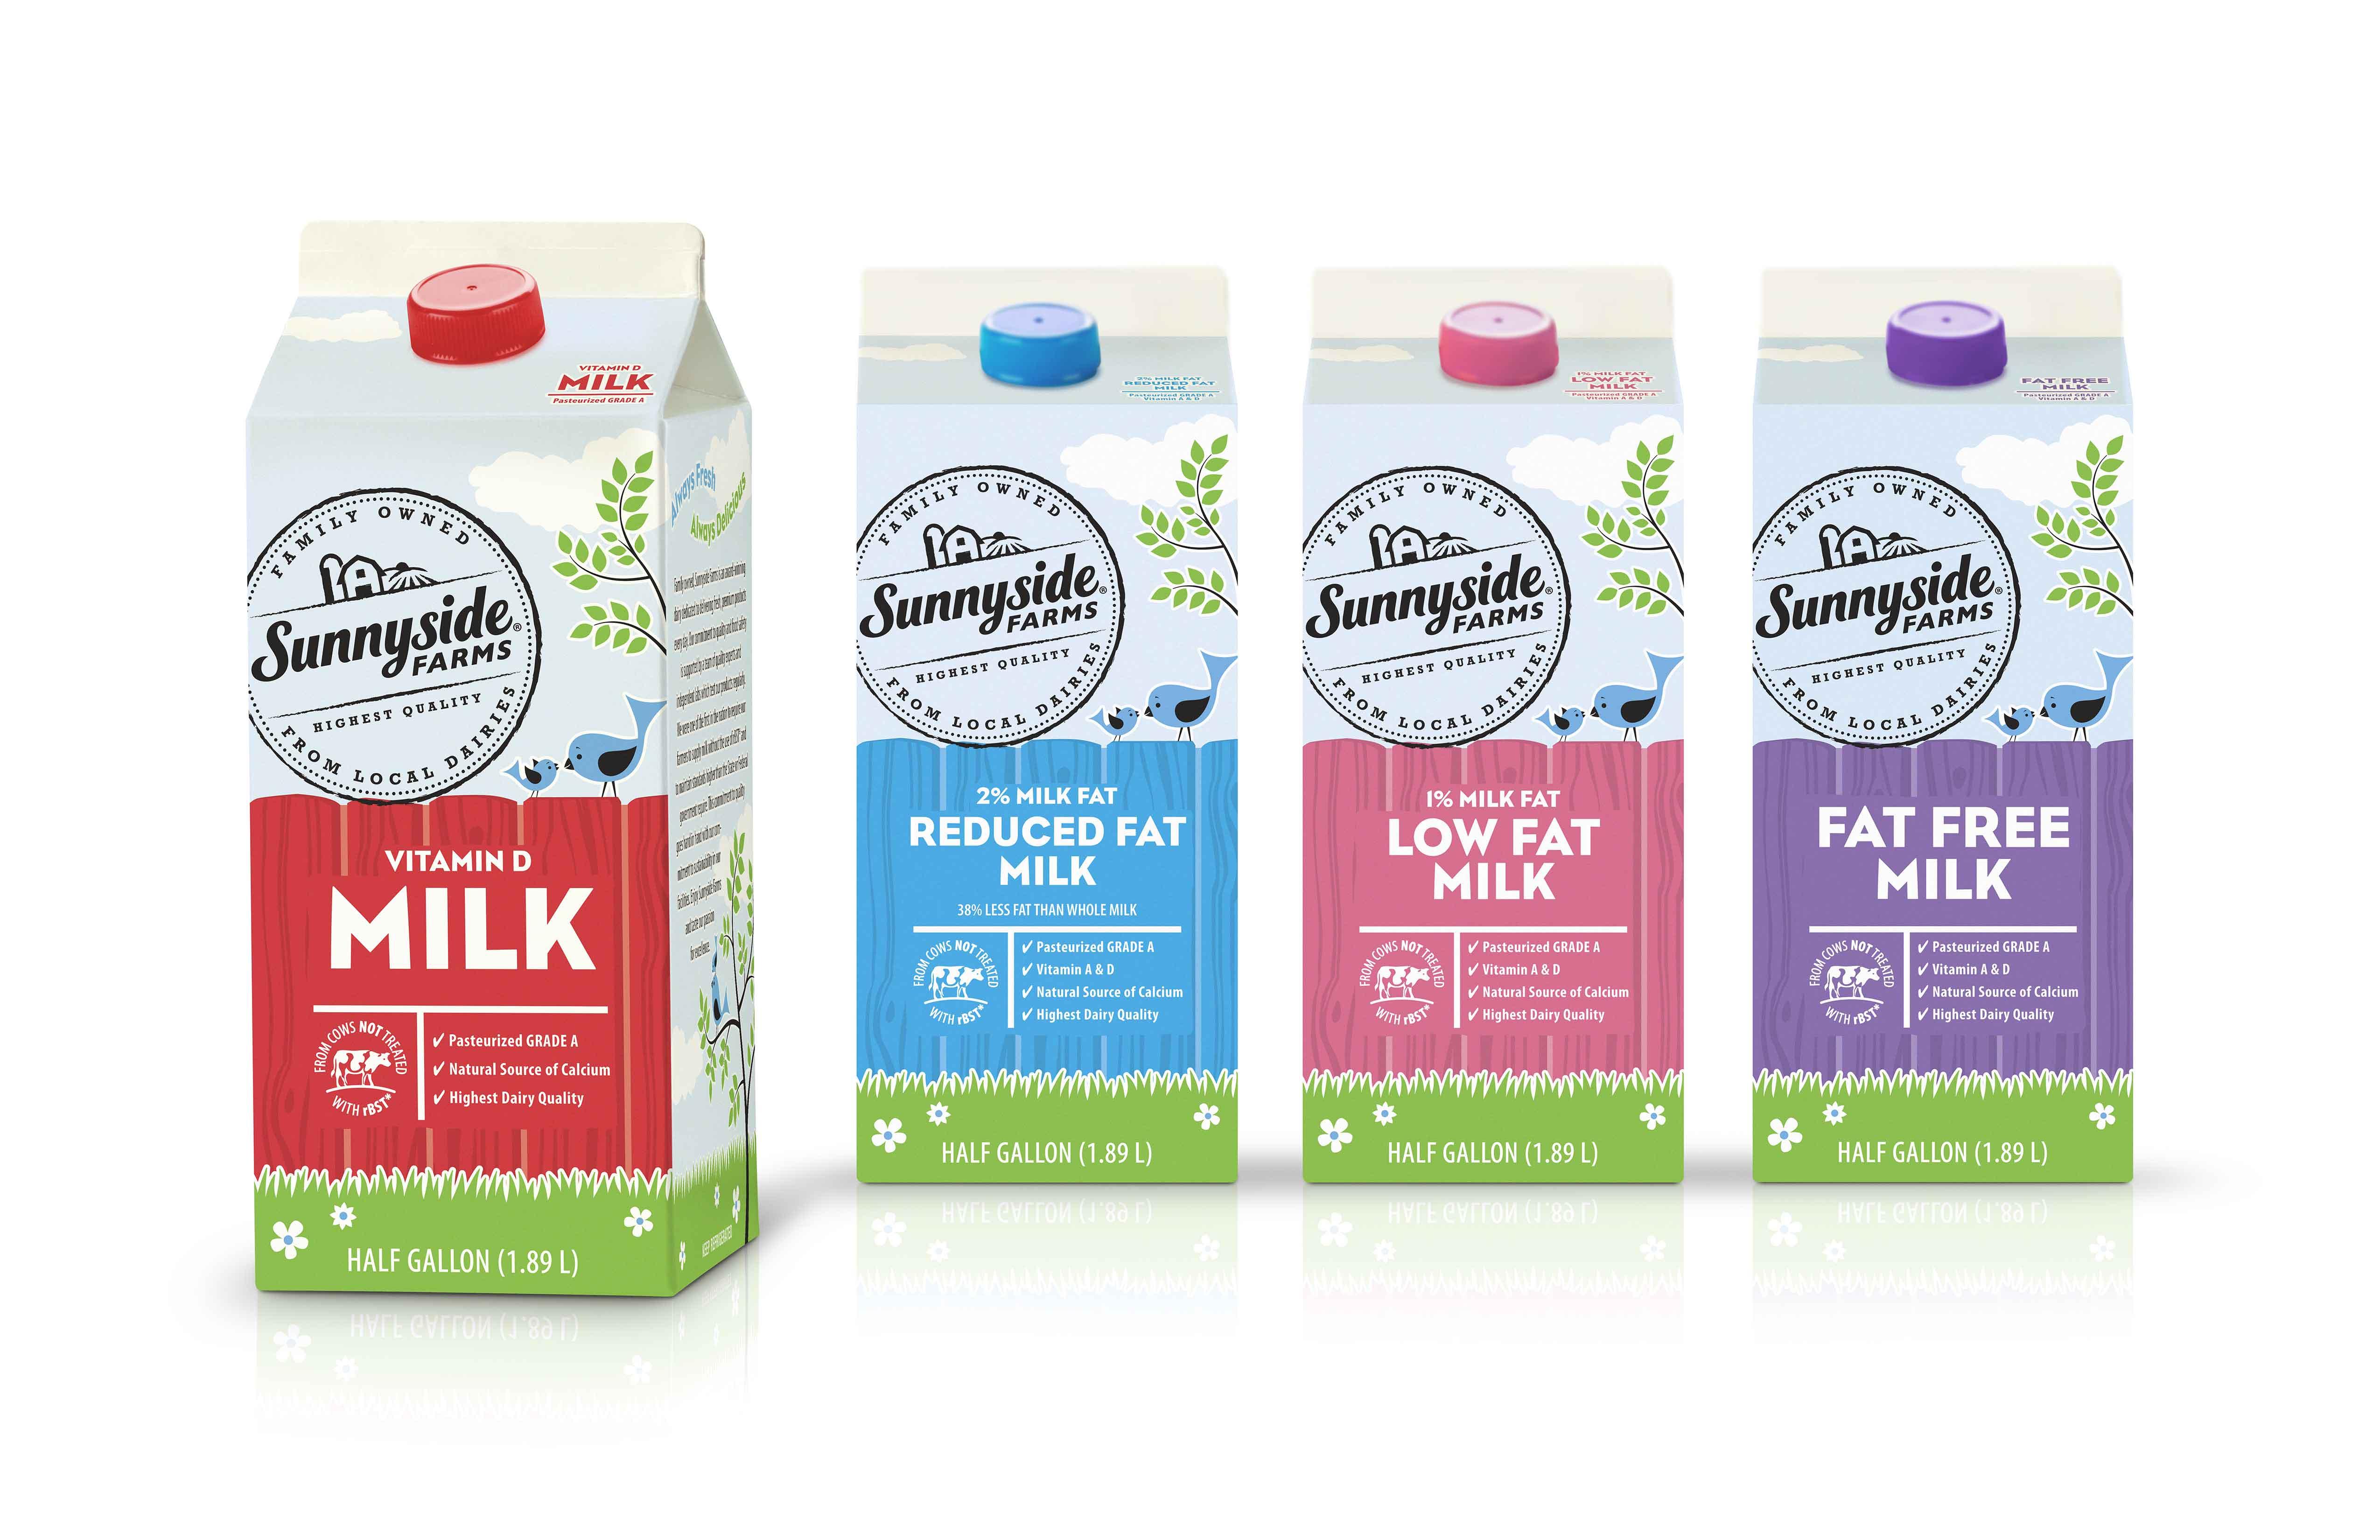 Sunnyside Farms Milk Packaging Design